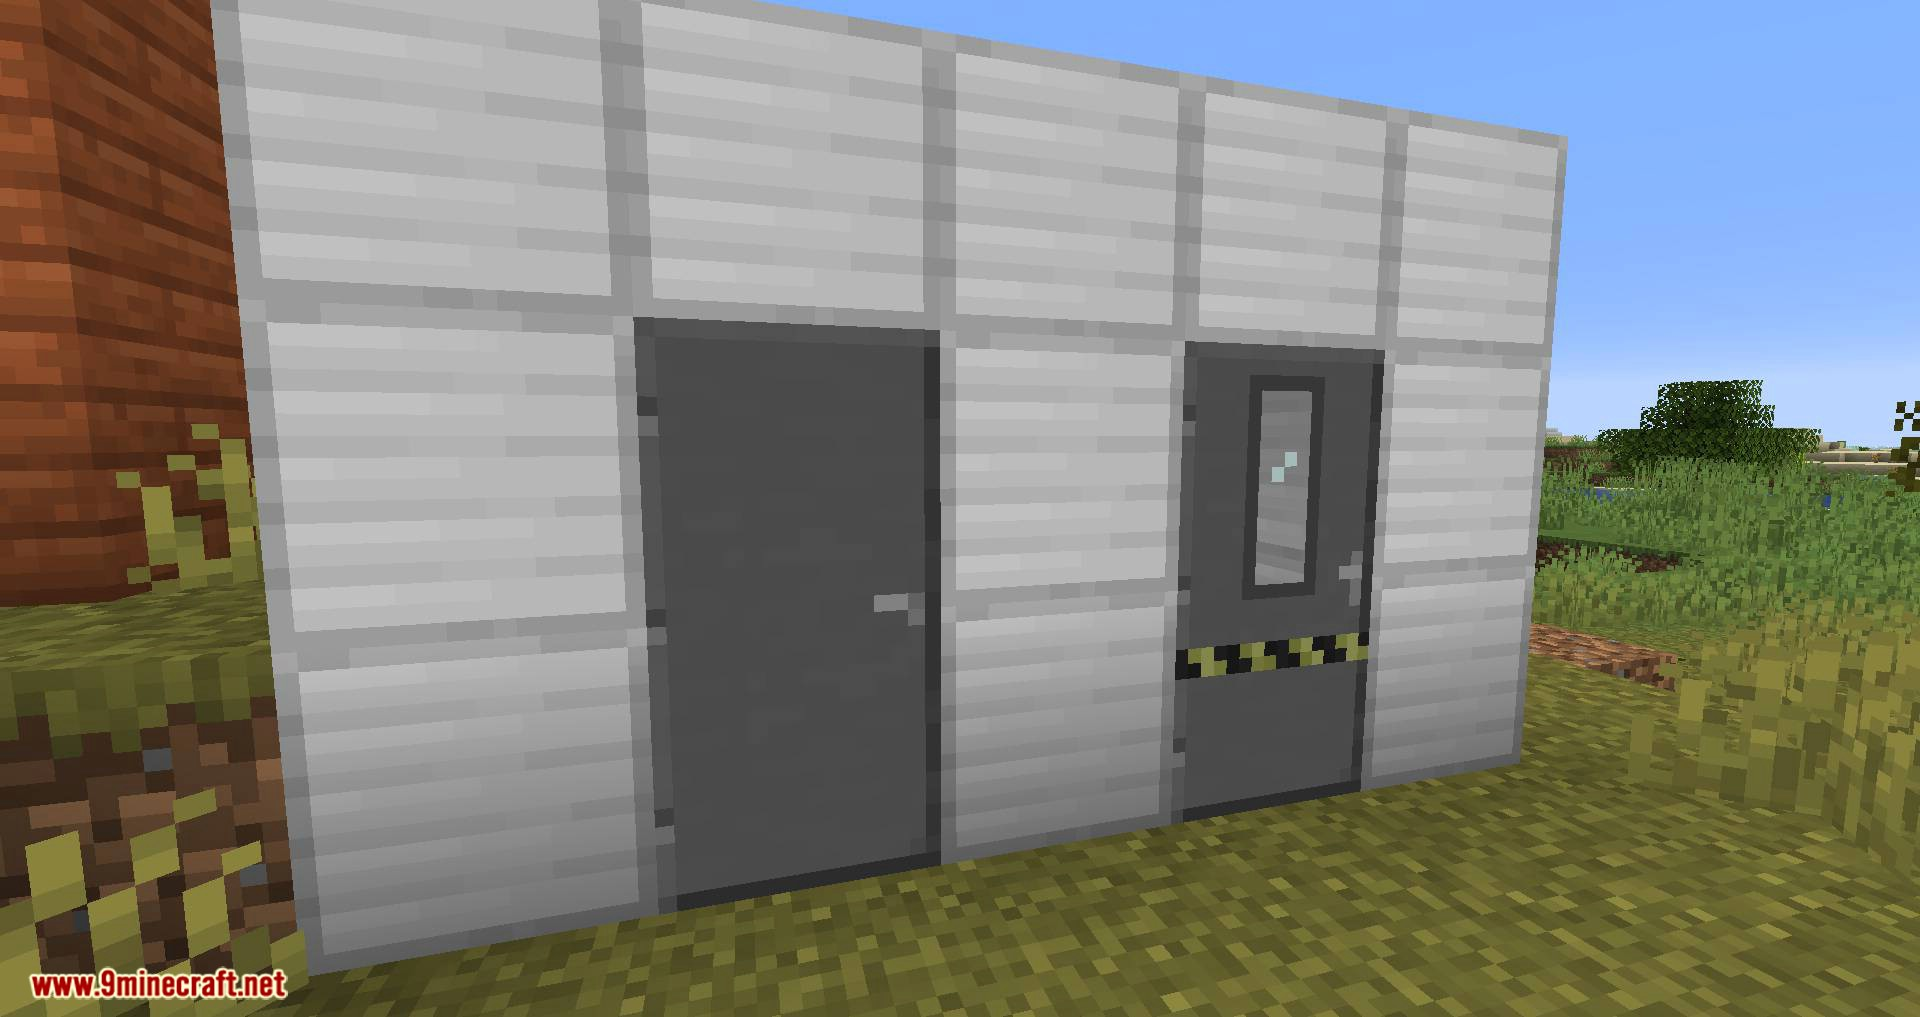 Macaw_s Doors mod for minecraft 08